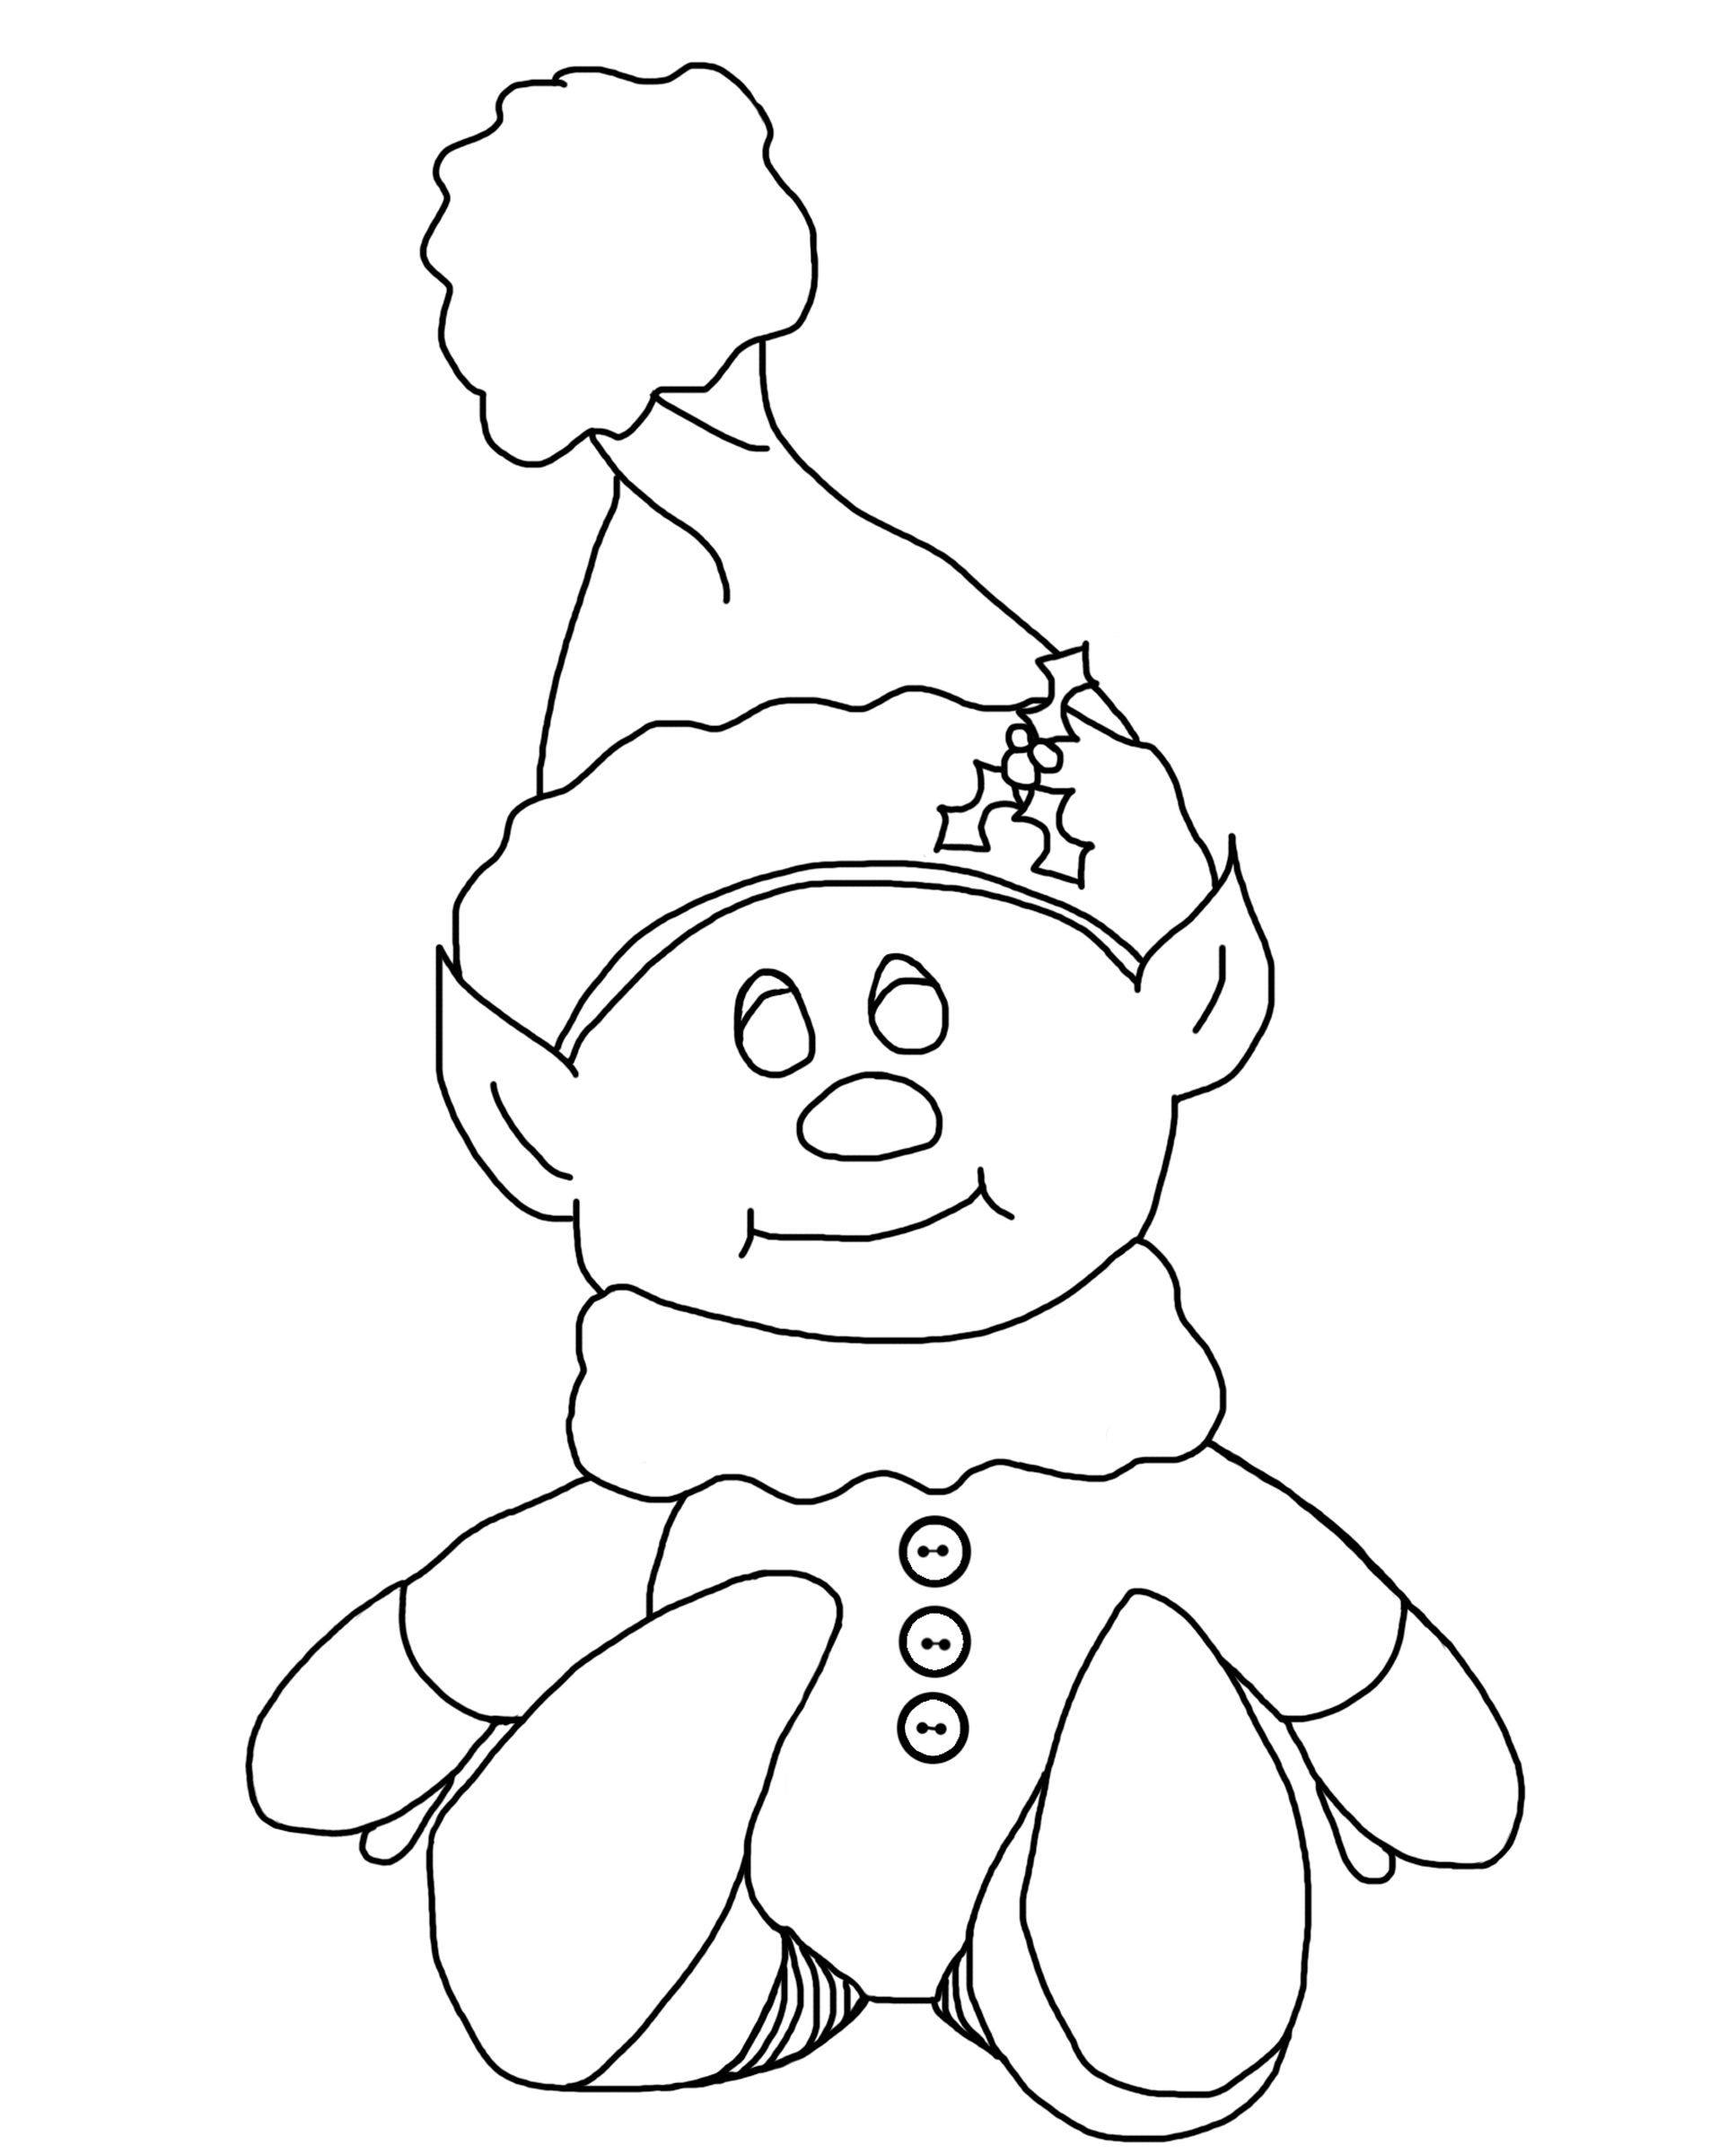 creepy little elf coloring page | Christmas elf, Christmas ...